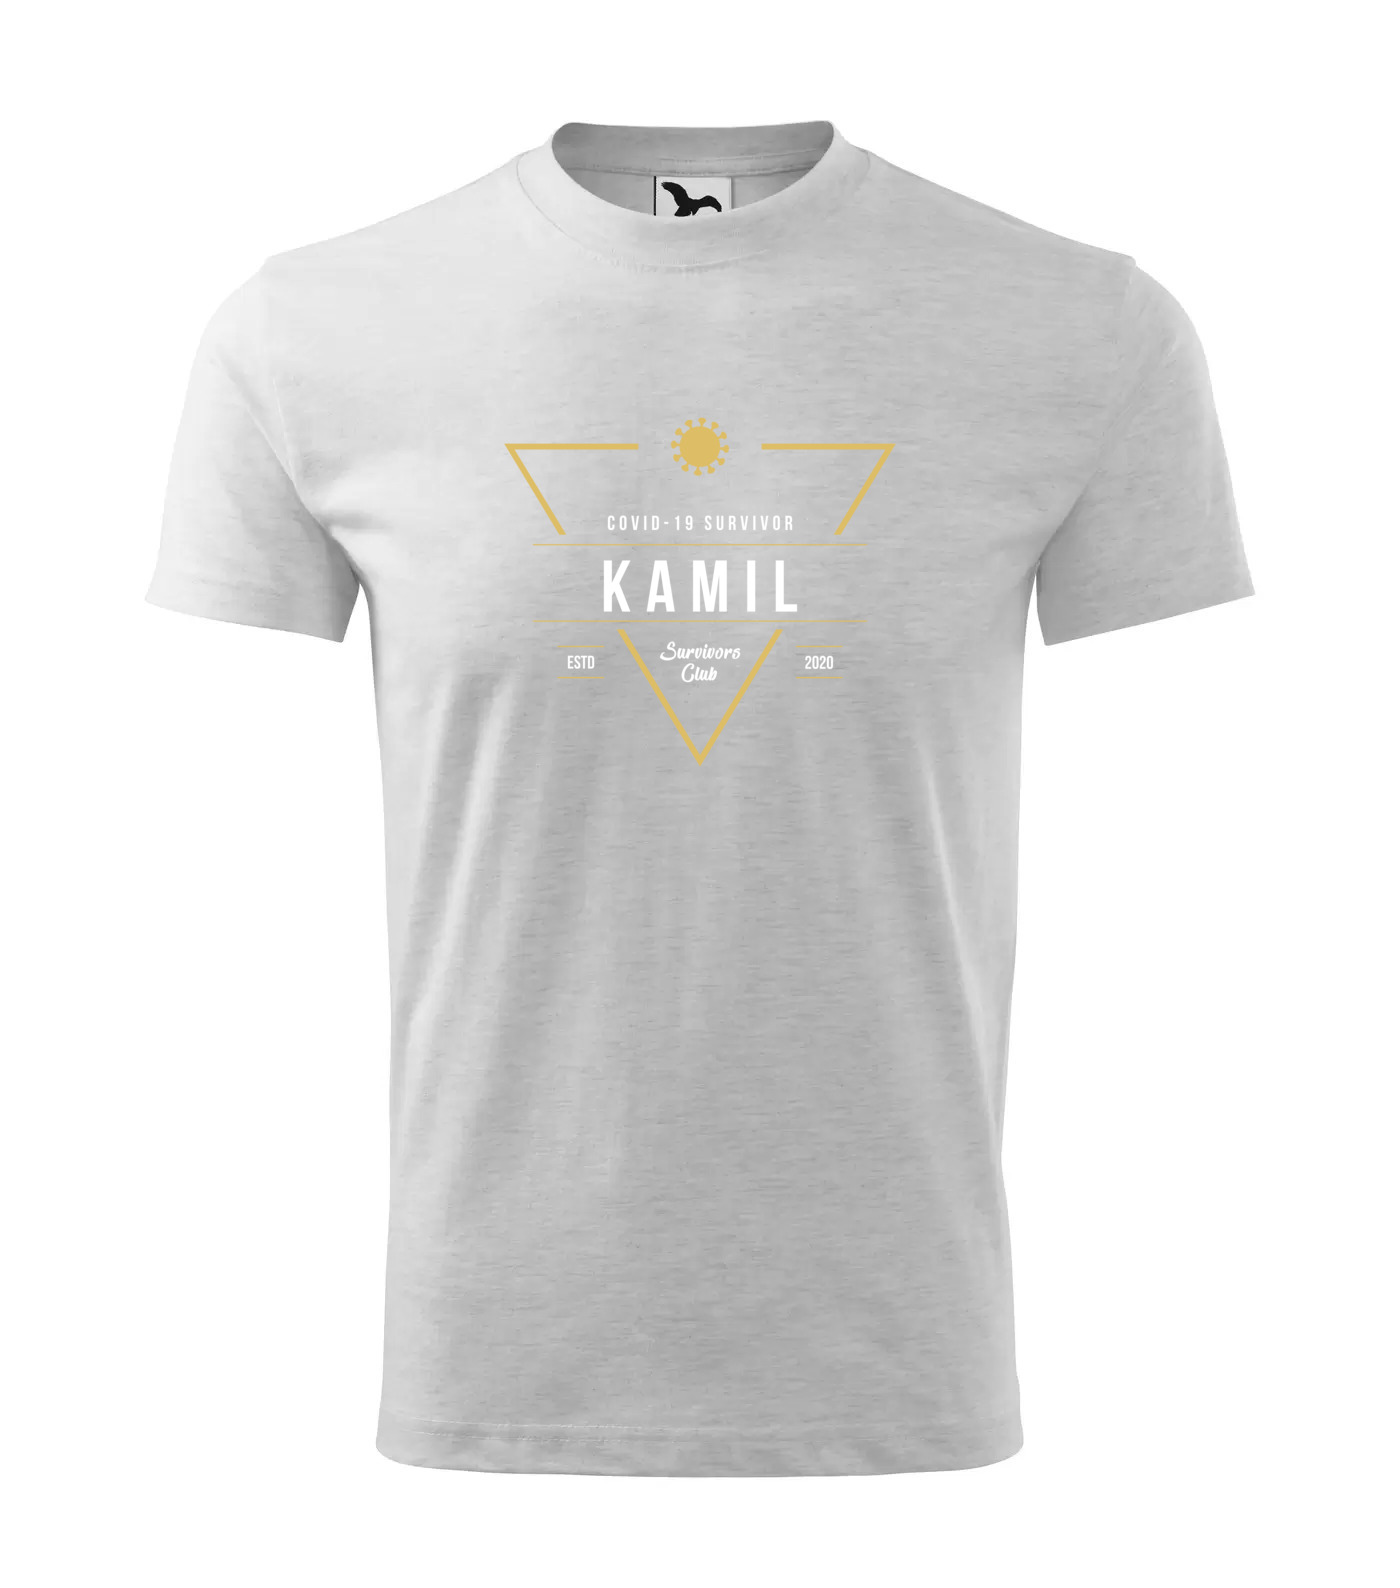 Tričko Survivor Club Kamil